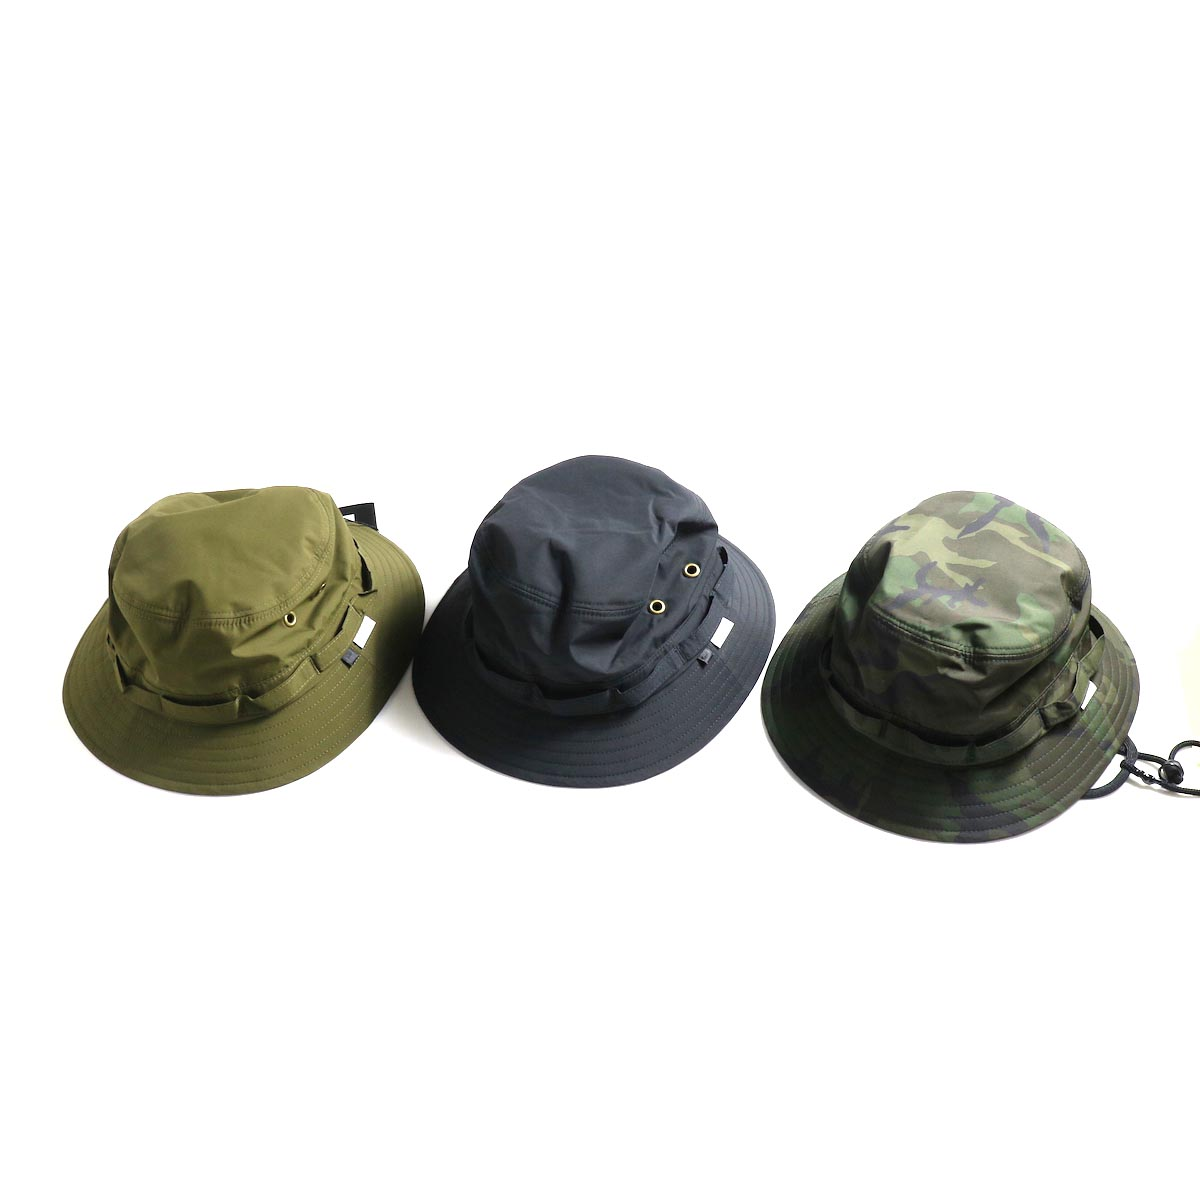 DAIWA PIER39 / GORE-TEX INFINIUM Tech Jungle hat